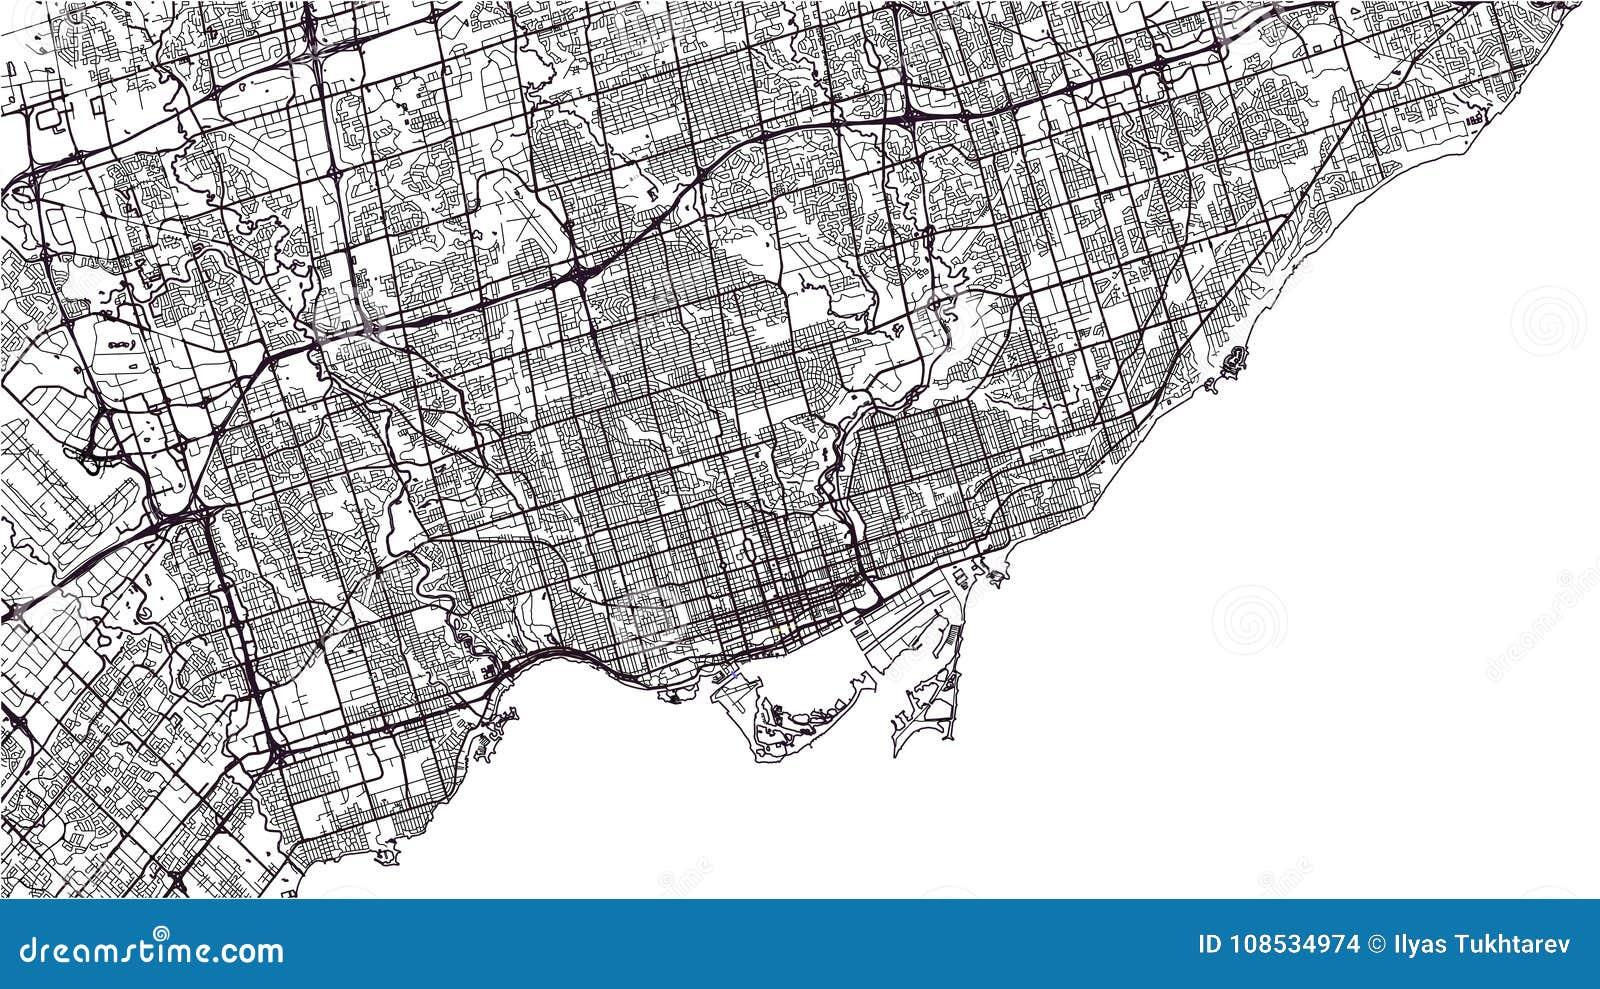 Image Map Of Toronto Canada on map of philadelphia, map of california, shopping toronto canada, tourism toronto canada, map of hong kong, house toronto canada, hotels in toronto canada, road map toronto canada, provinces of canada, map of ohio, cn tower toronto canada, weather toronto canada, ontario canada, map of japan, map of usa, map of new york, map of istanbul turkey, map of las vegas, wonder mountain toronto canada, landmarks toronto canada,